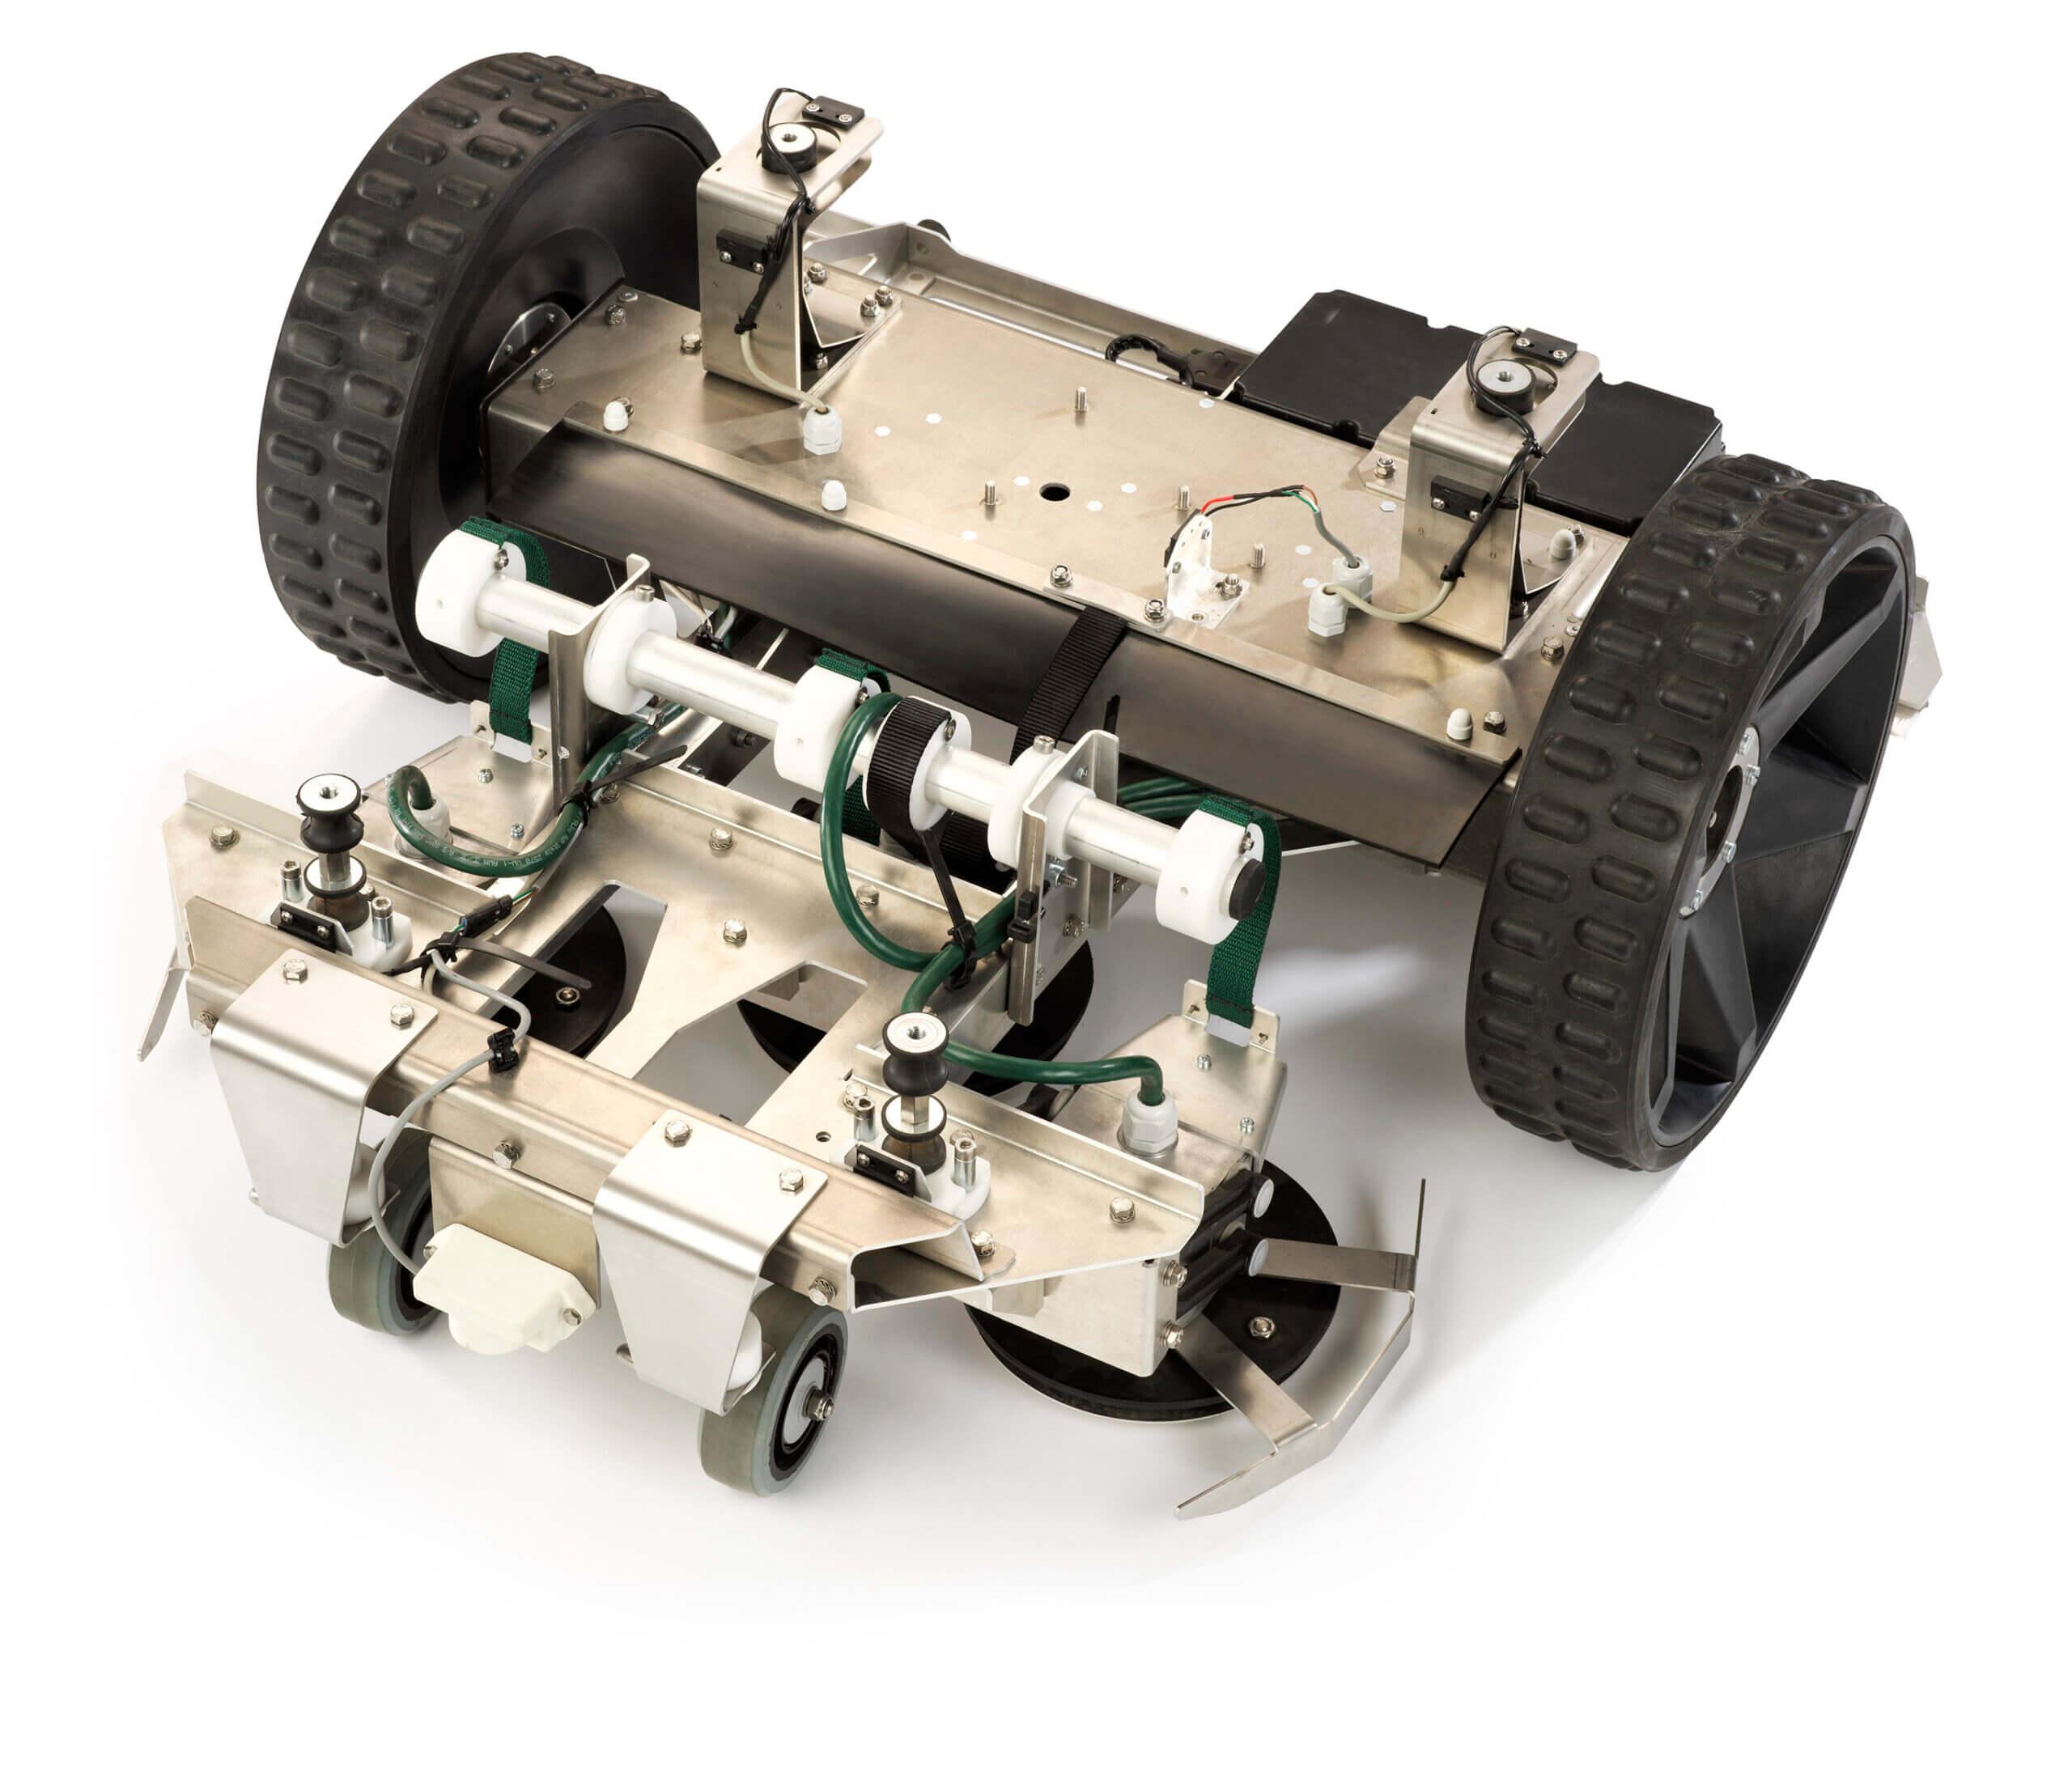 Belrobotics PARCMOW Connected Robotic Mower